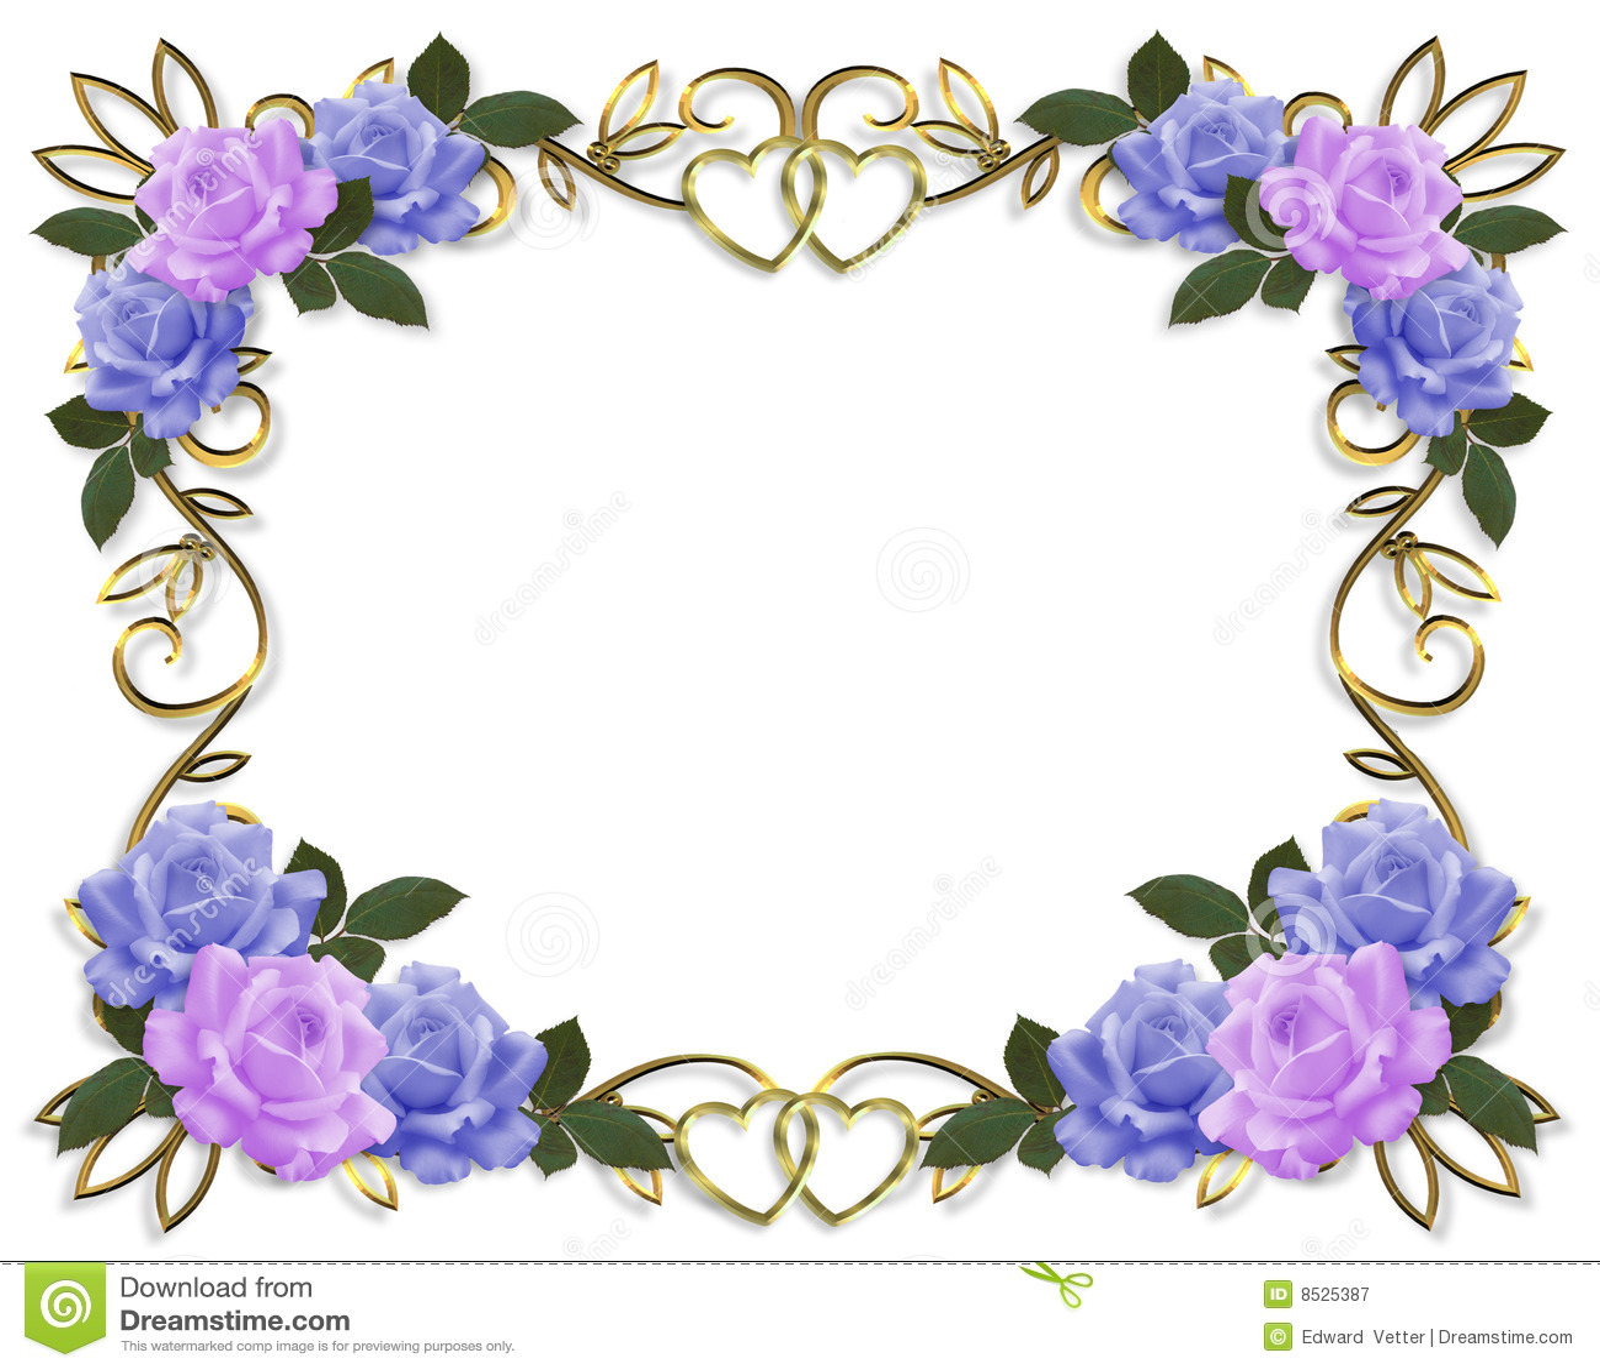 Rose Flower Page Border - comousar